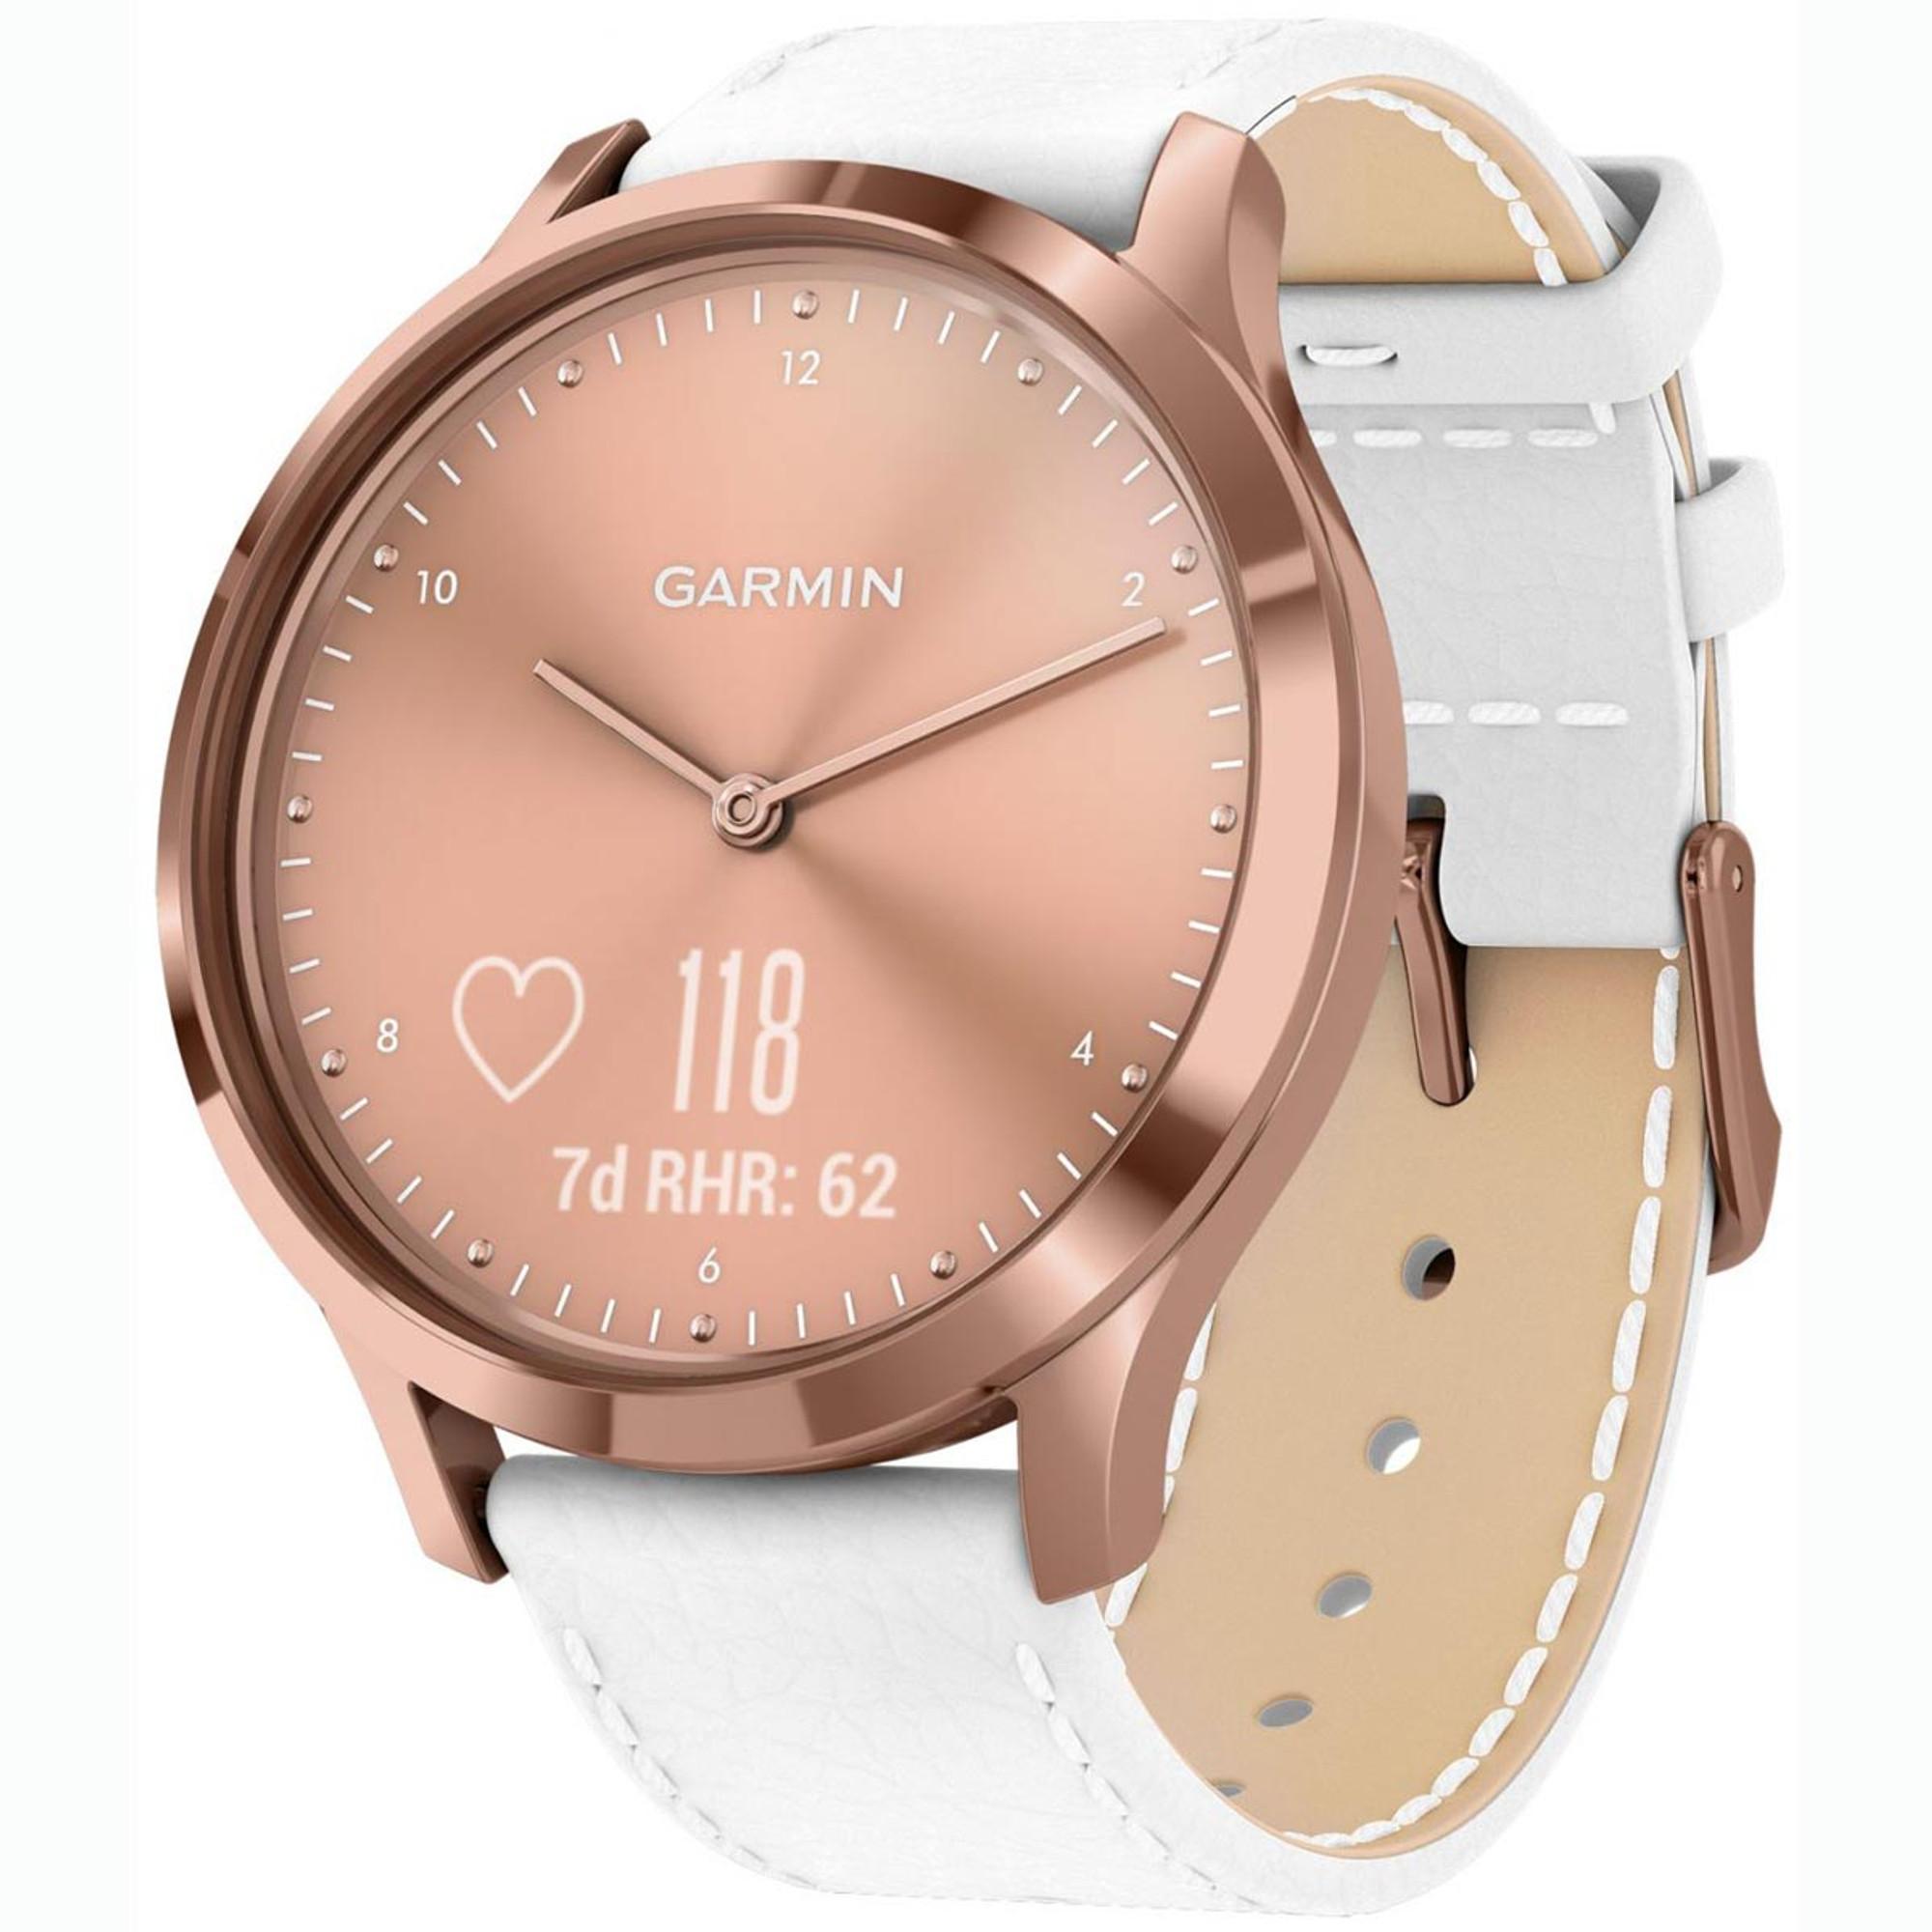 GARMIN vívomove HR Premium Hybrid Smartwatch 010-01850-AB